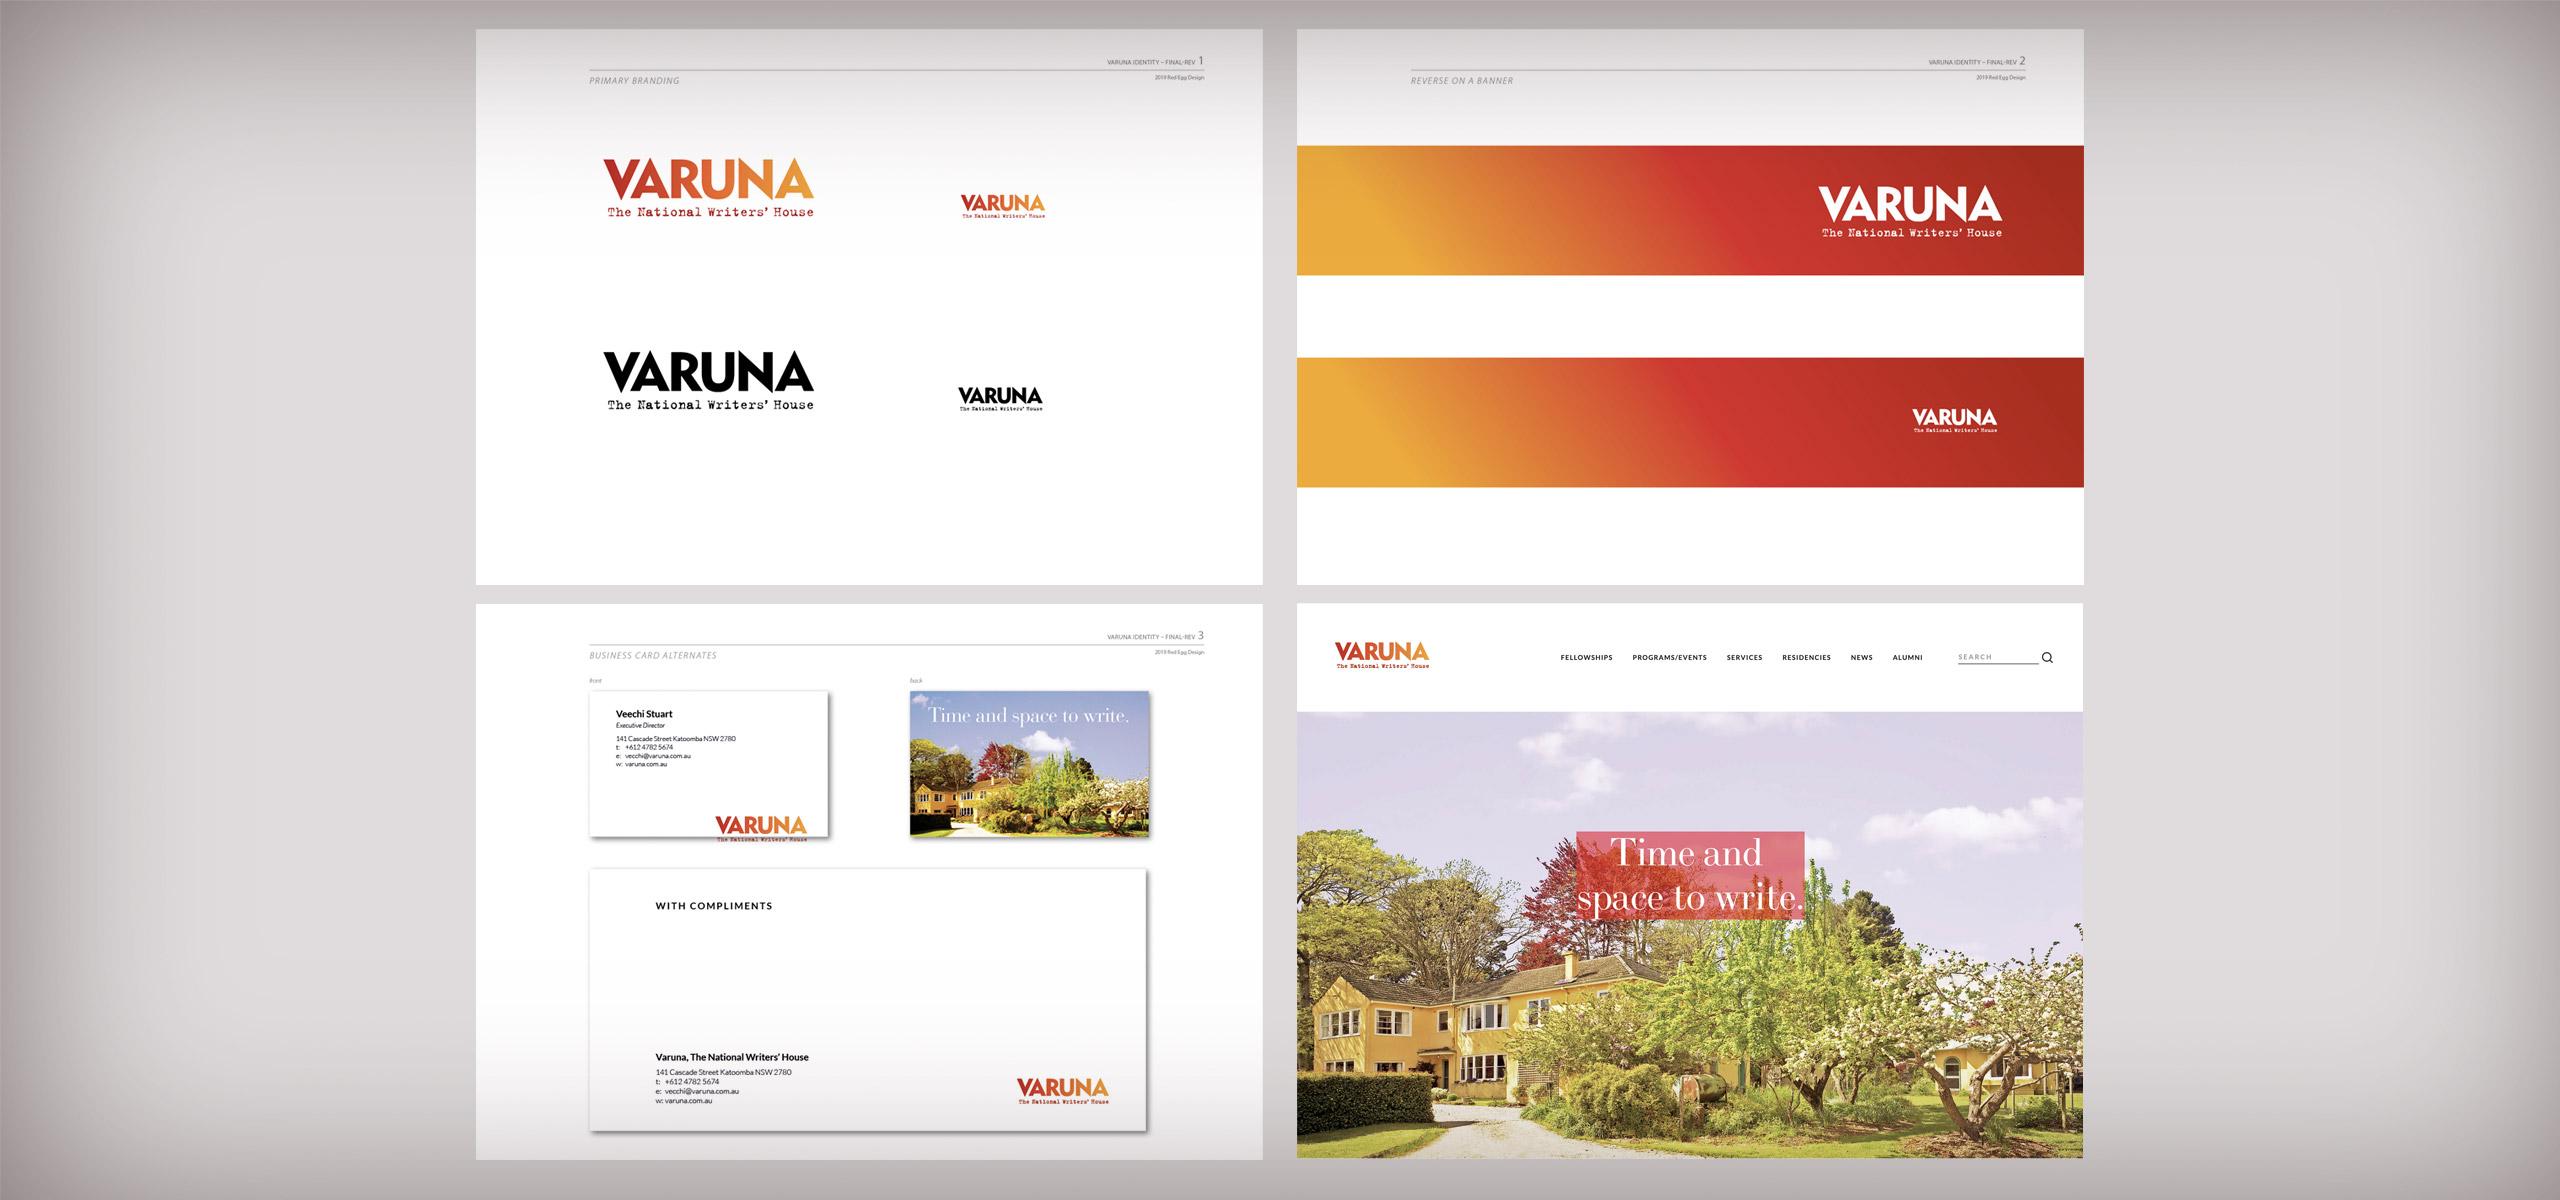 Works-Varuna-Identity-1